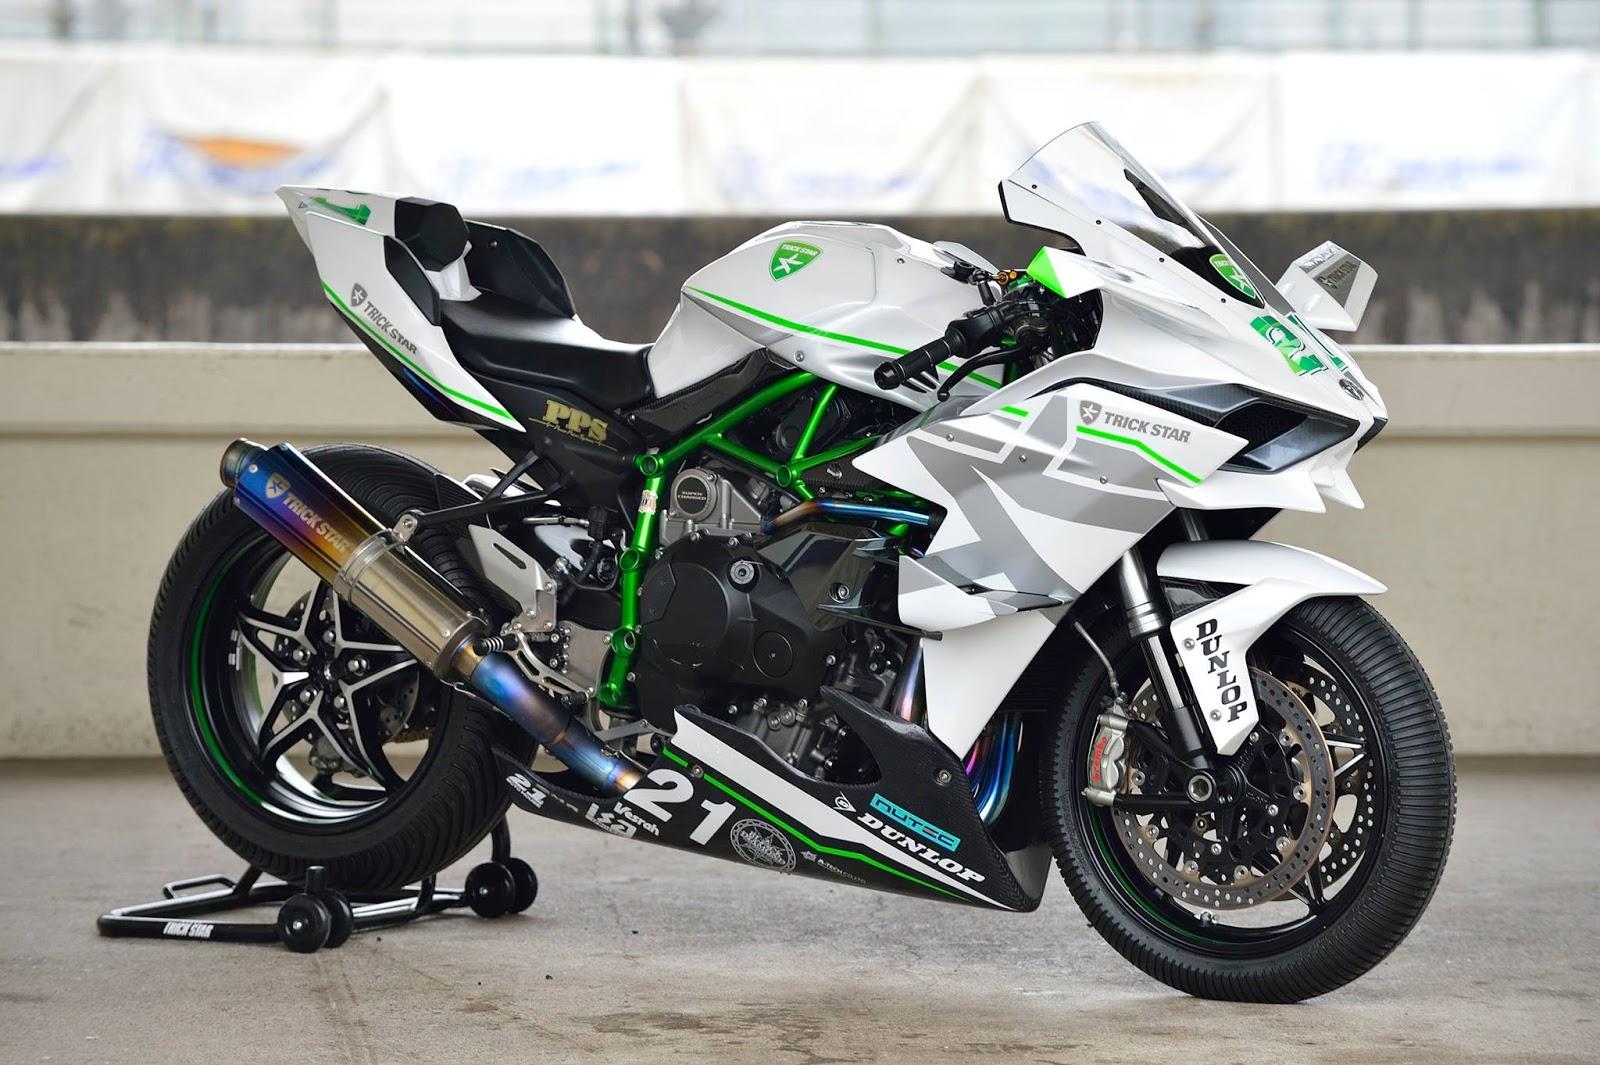 Auto Racing Helmets >> Planet Japan Blog: Kawasaki Ninja H2R by Trickstar